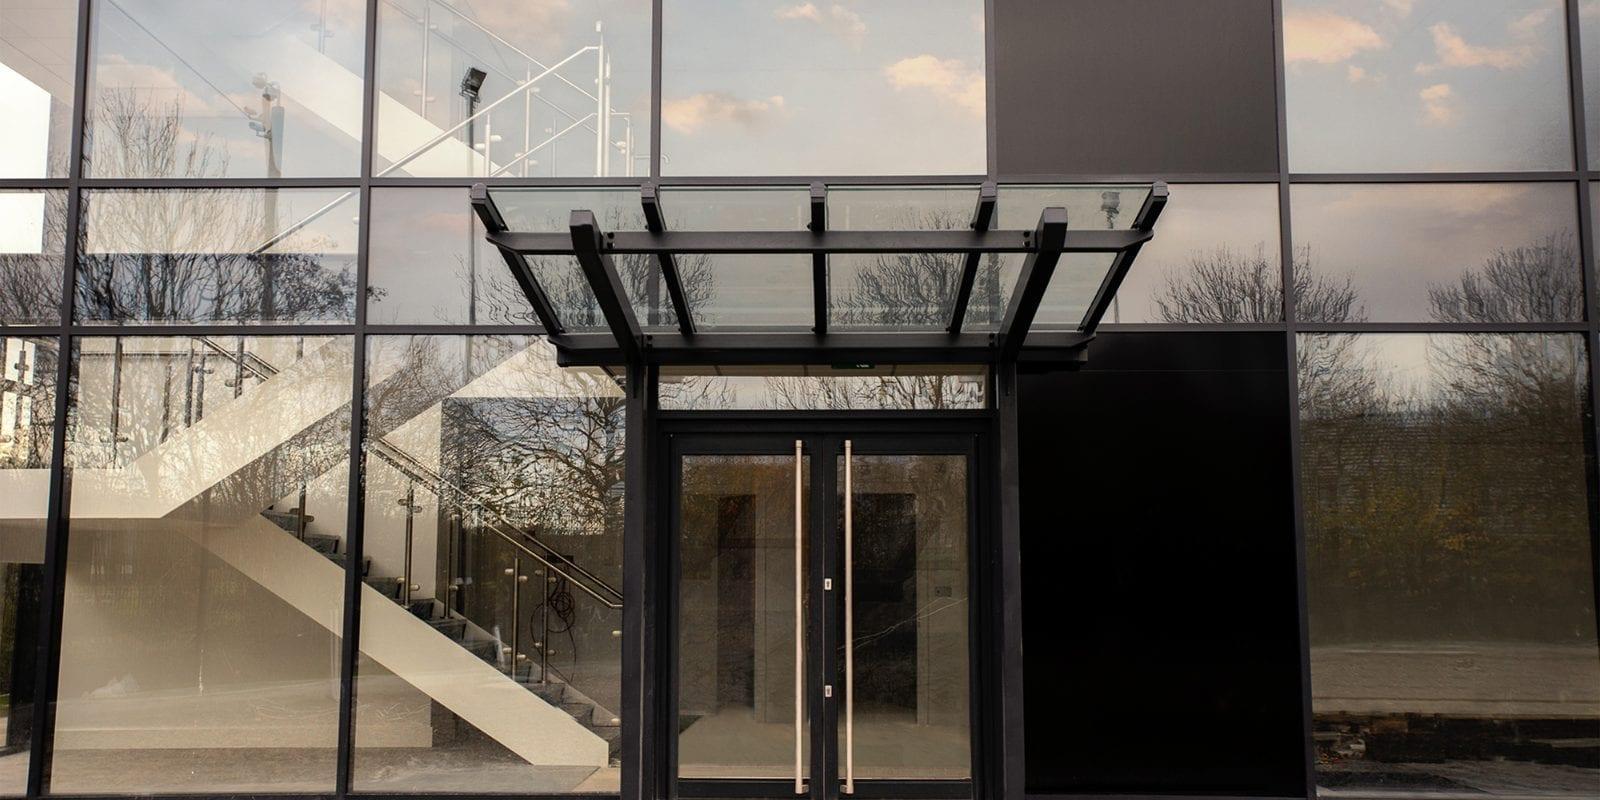 Door canopy we designed for Estuary Boulevard